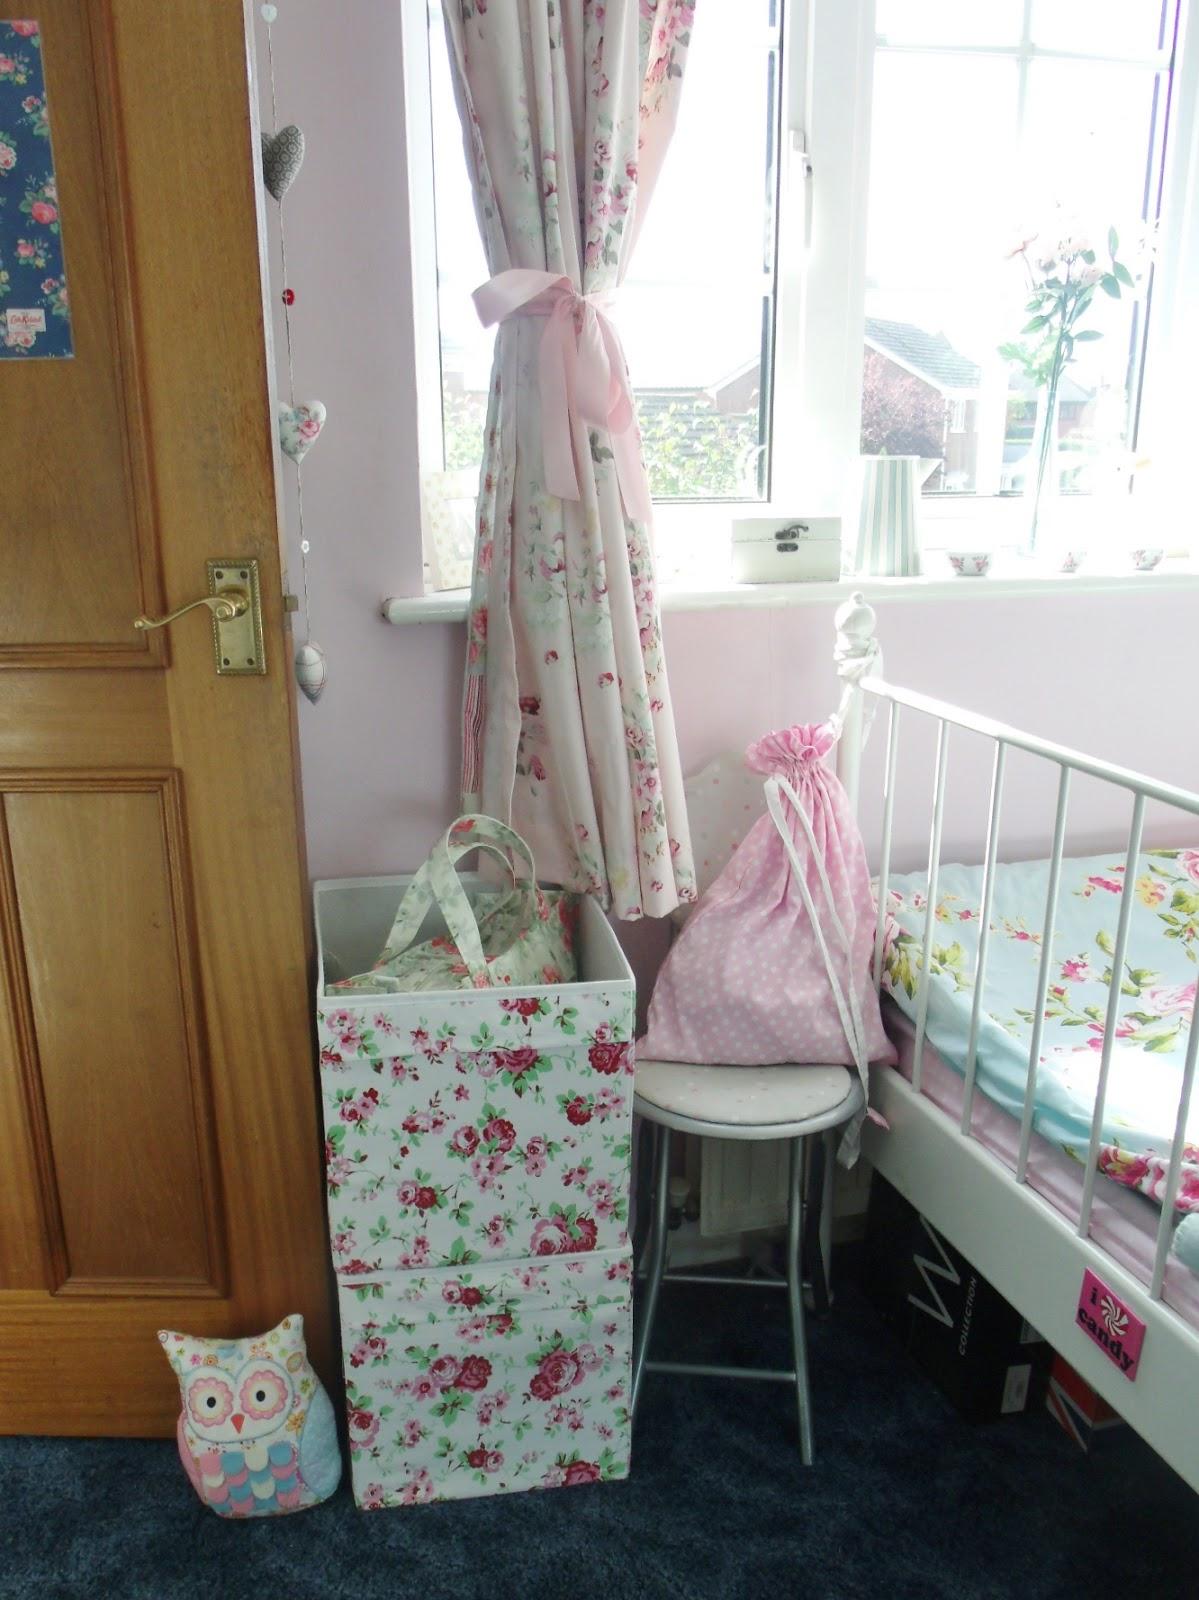 glamorous neeny wishlist ikea bedroom inspiration | New Bedroom Pieces - Ikea & DIY ♥ | Victoria's Vintage Blog